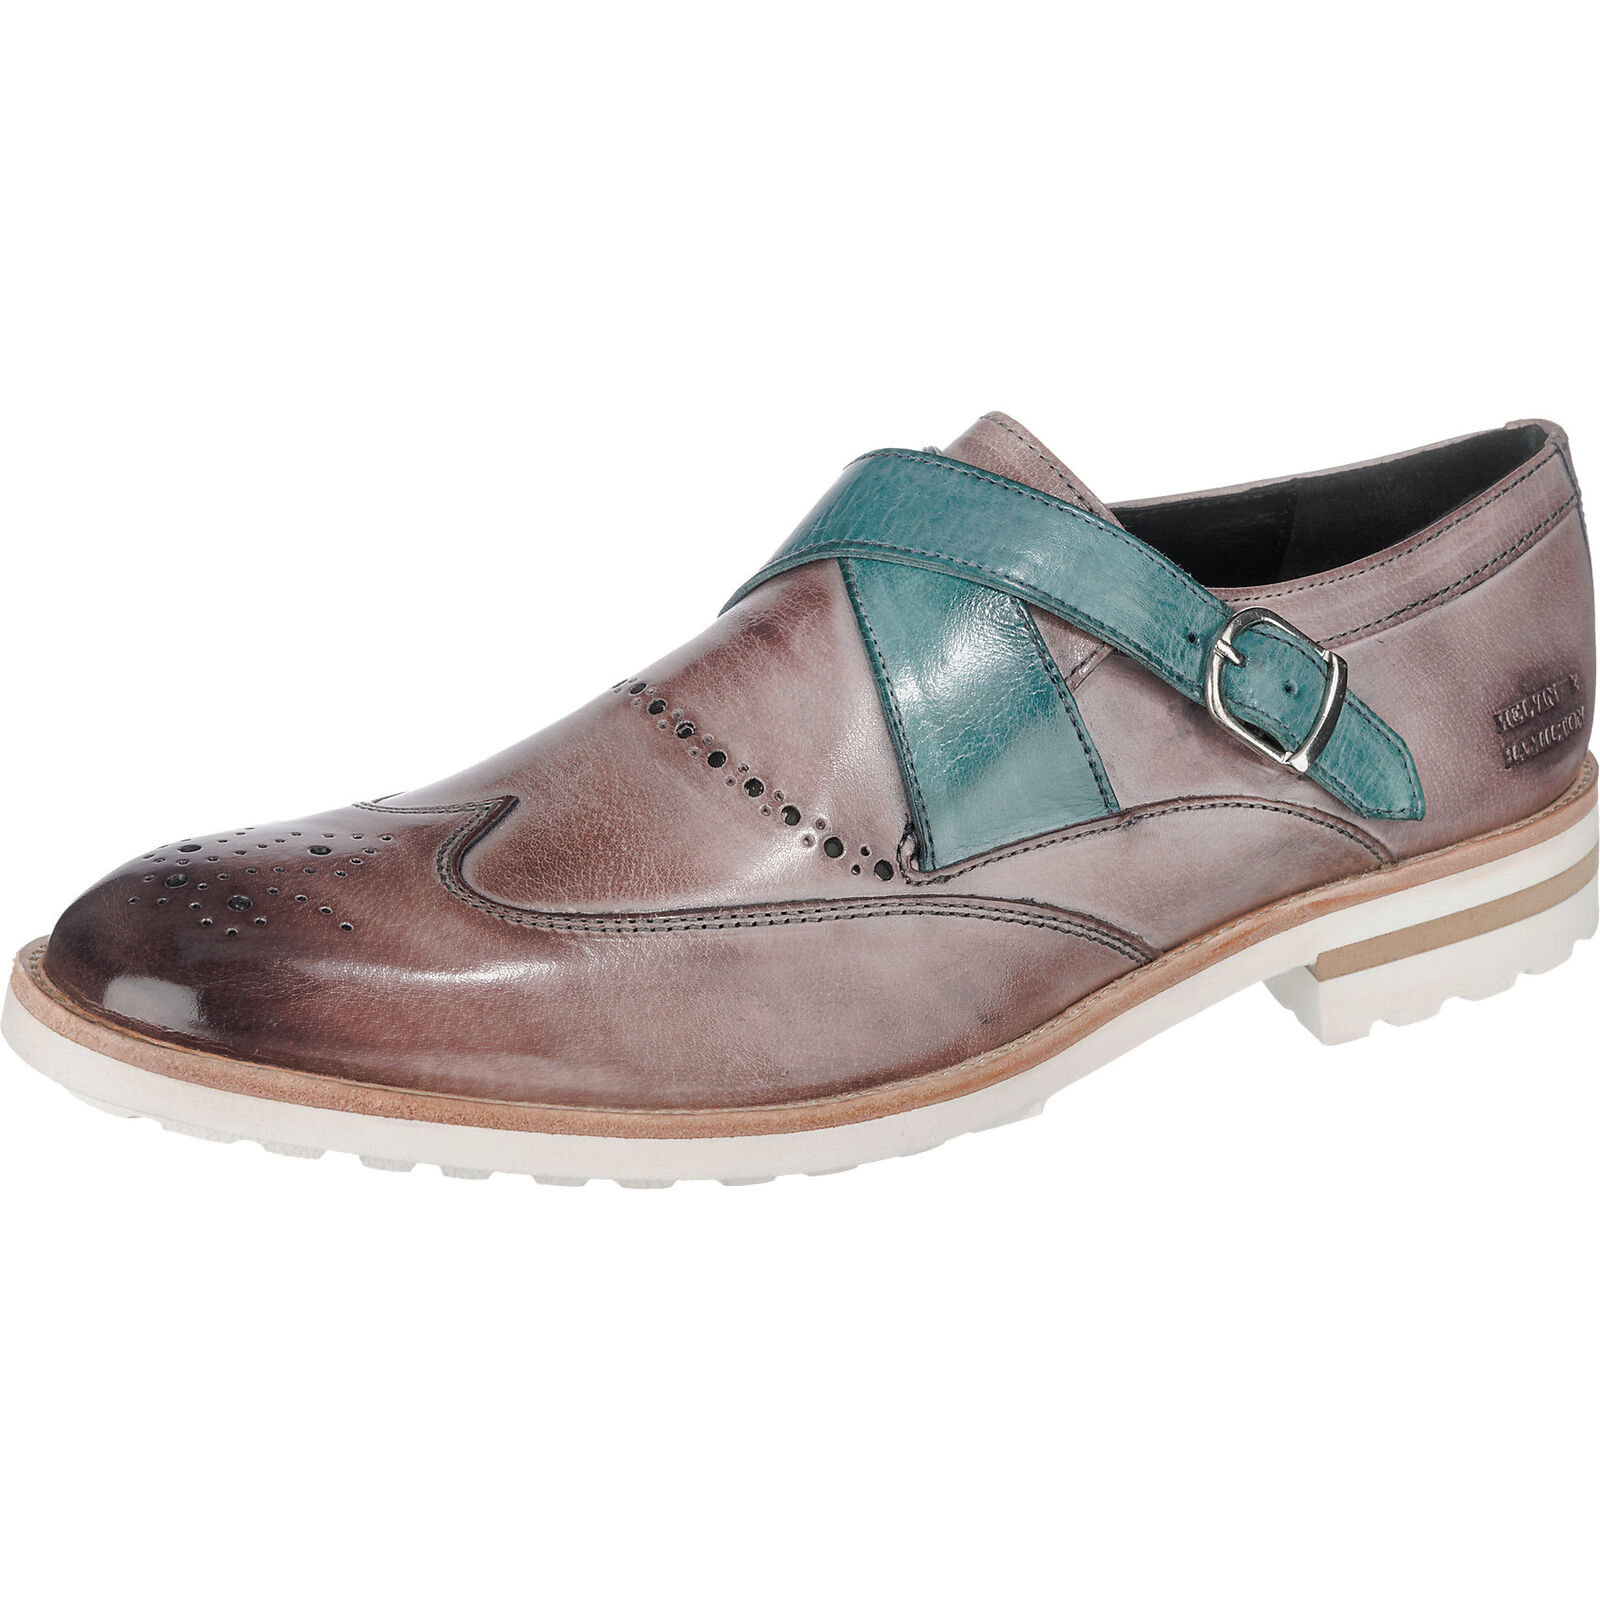 Neu MELVIN & HAMILTON Eddy 14 Business Schuhe lila-kombi 5772989